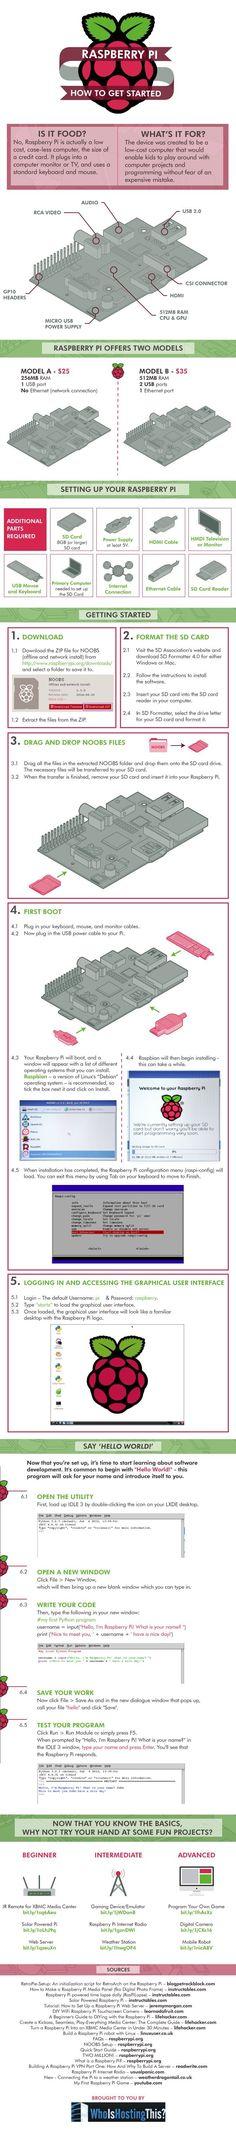 Raspberry Pi: How To